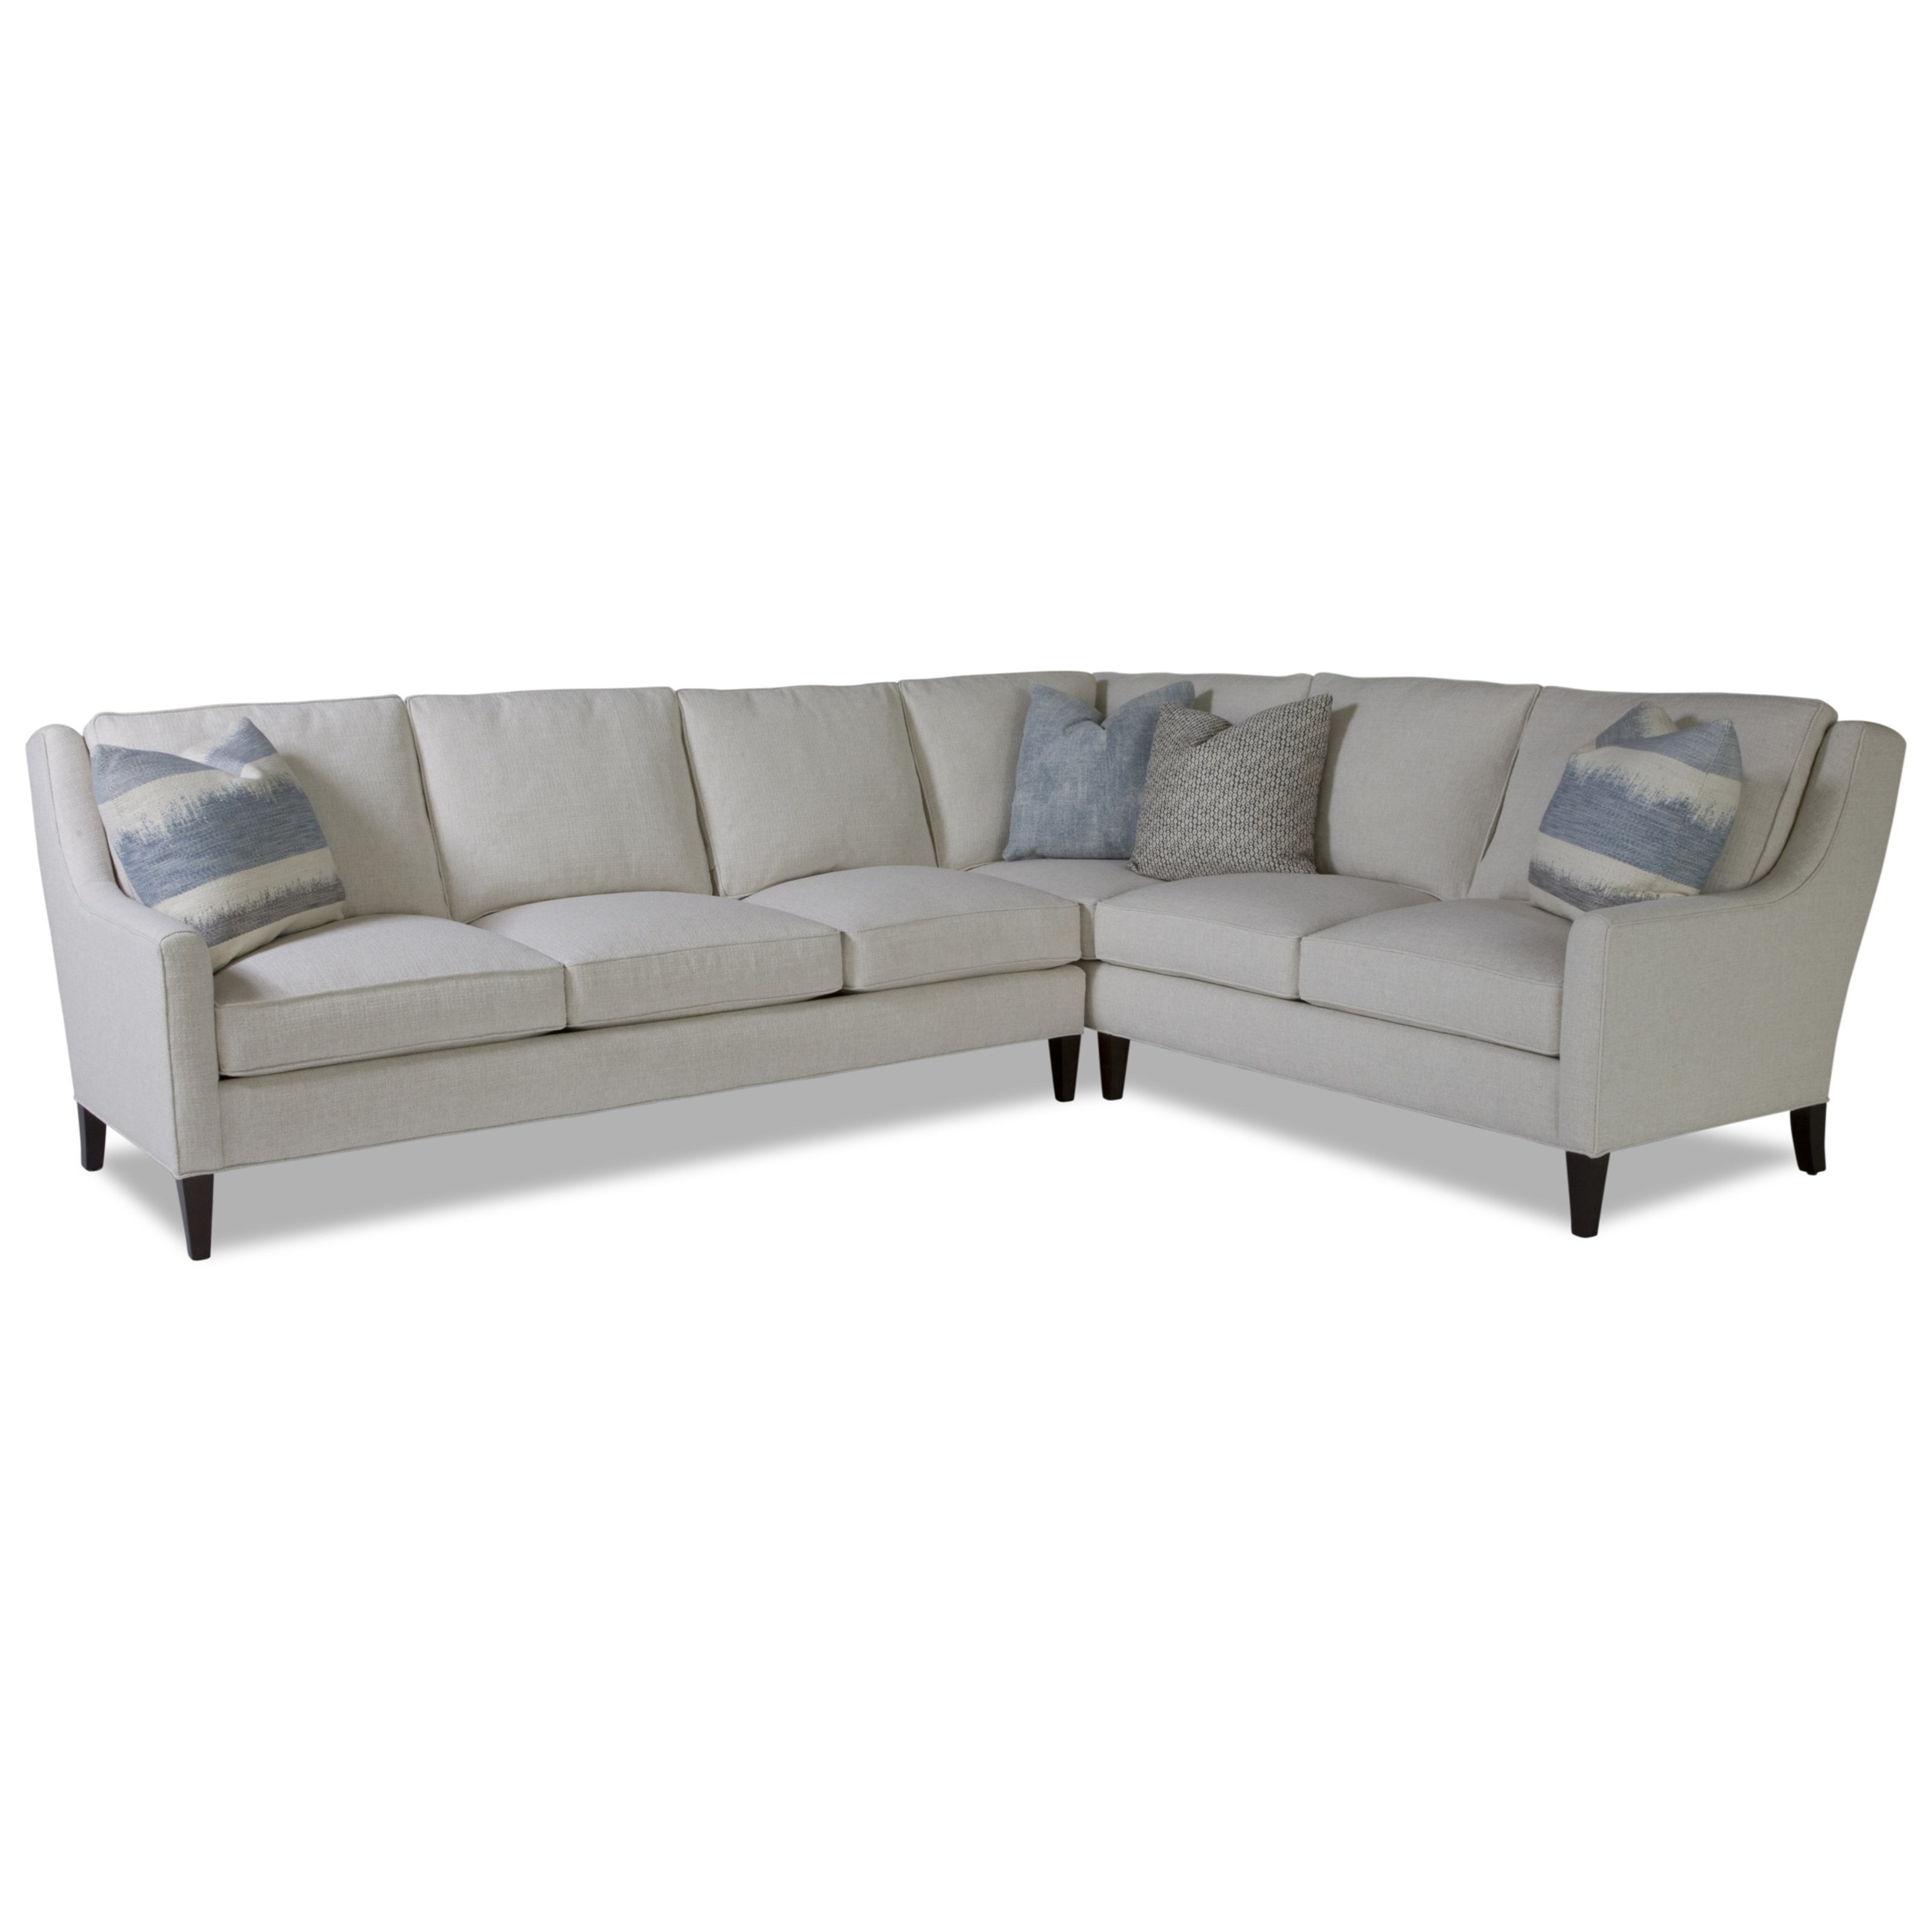 Laguna Sectional Sofa by Huntington House at Belfort Furniture